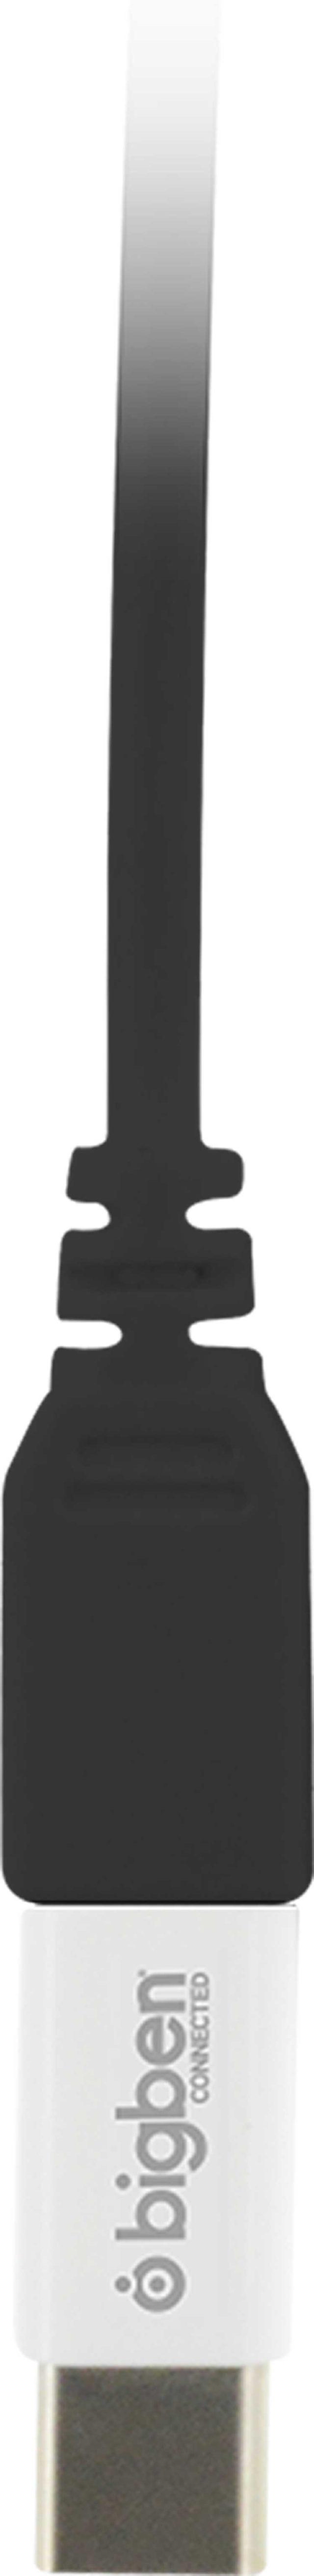 Adaptateur Micro USB/USB C – Visuel#1